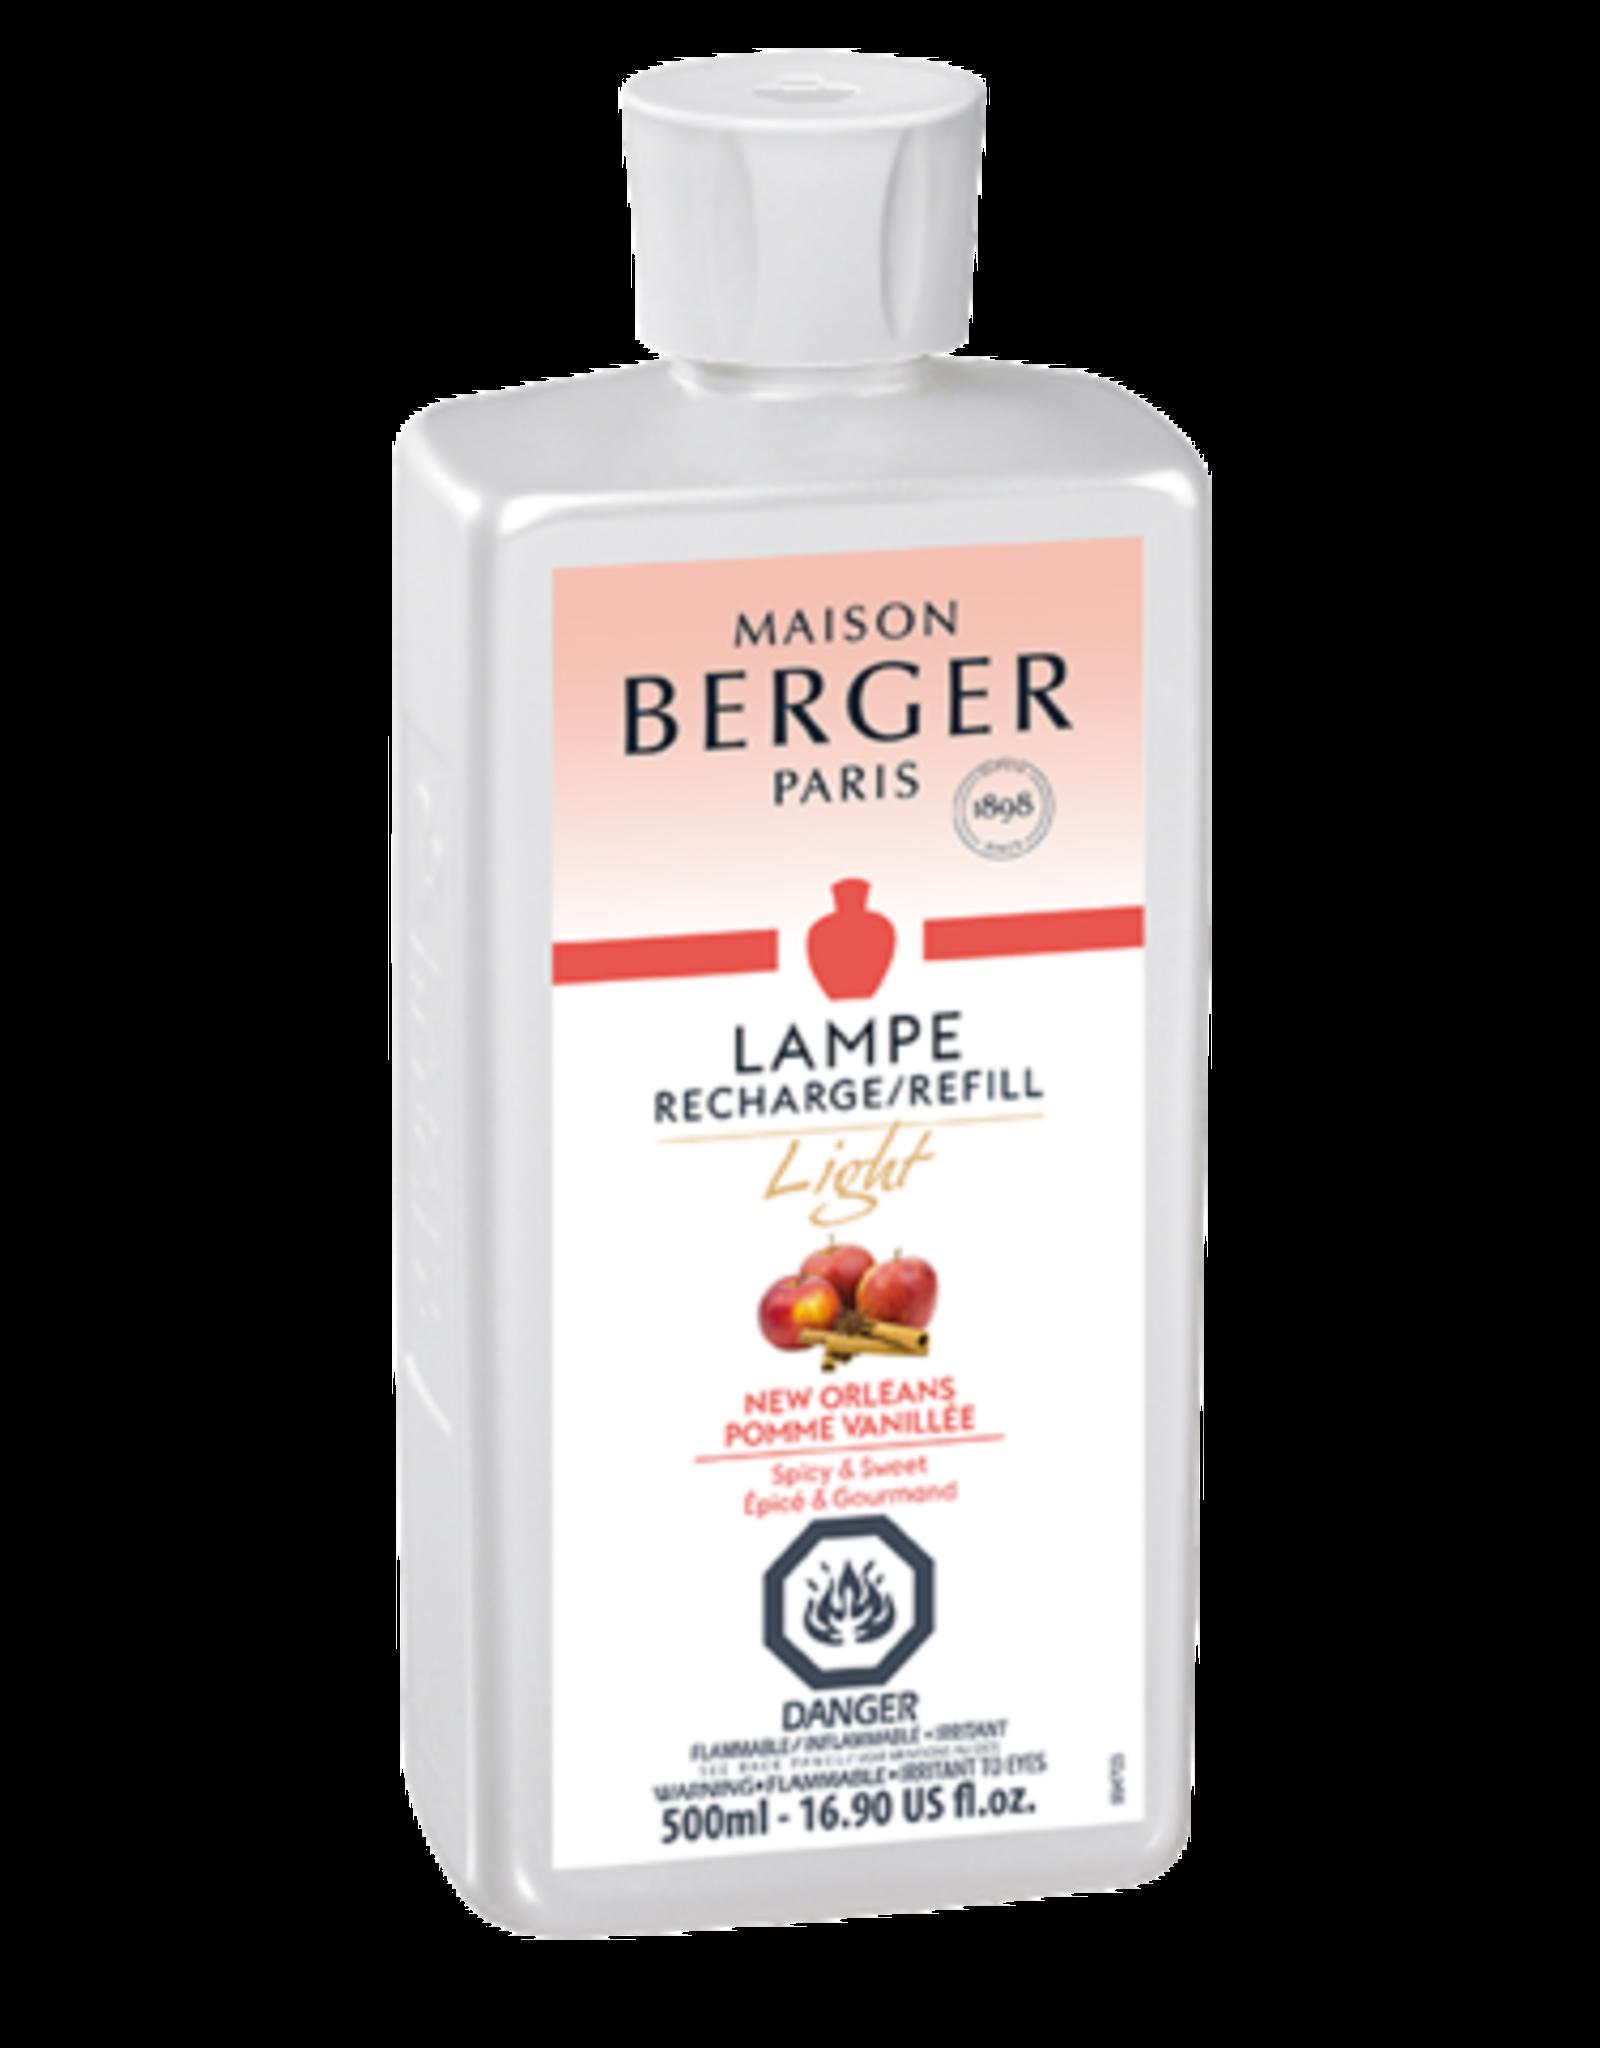 Maison Berger Pomme Vanillée Light 500ml